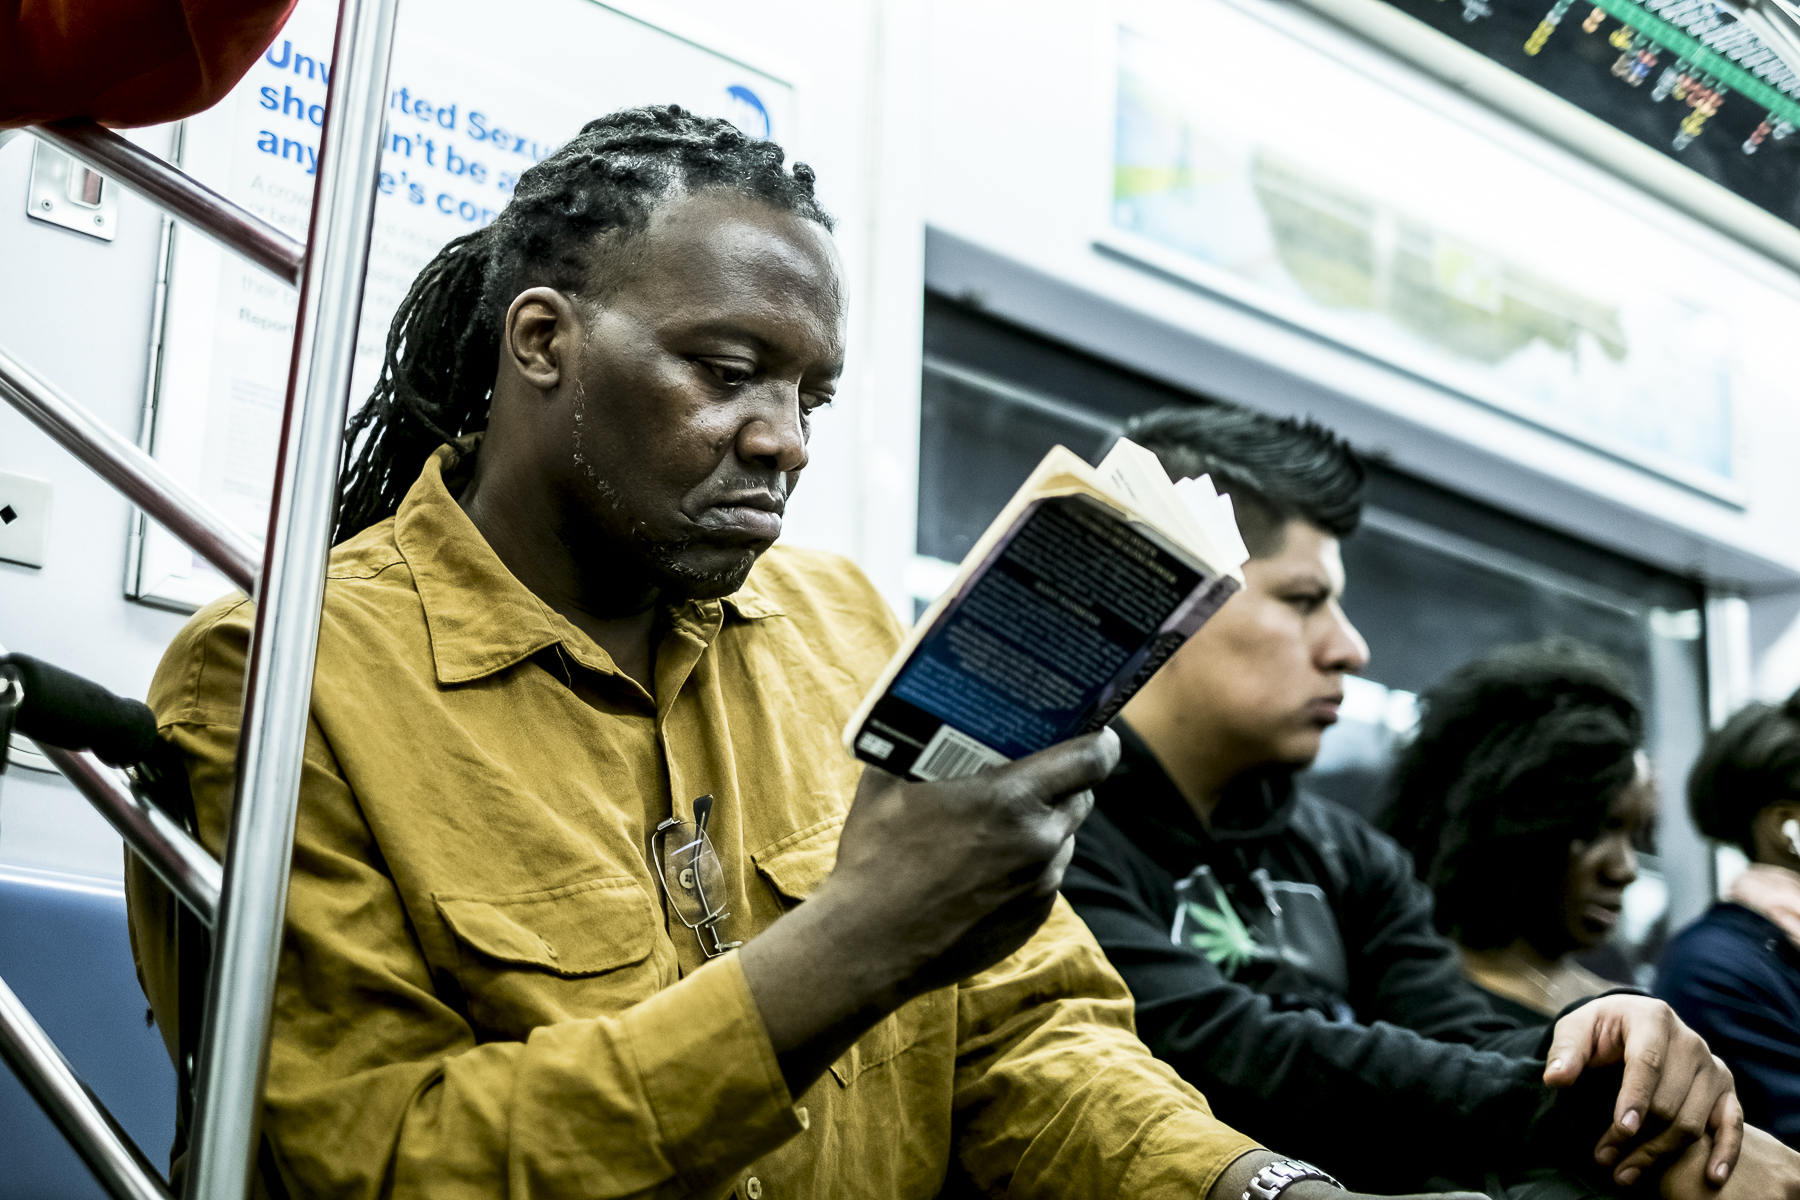 Metro New York / Zaragoza Walkers